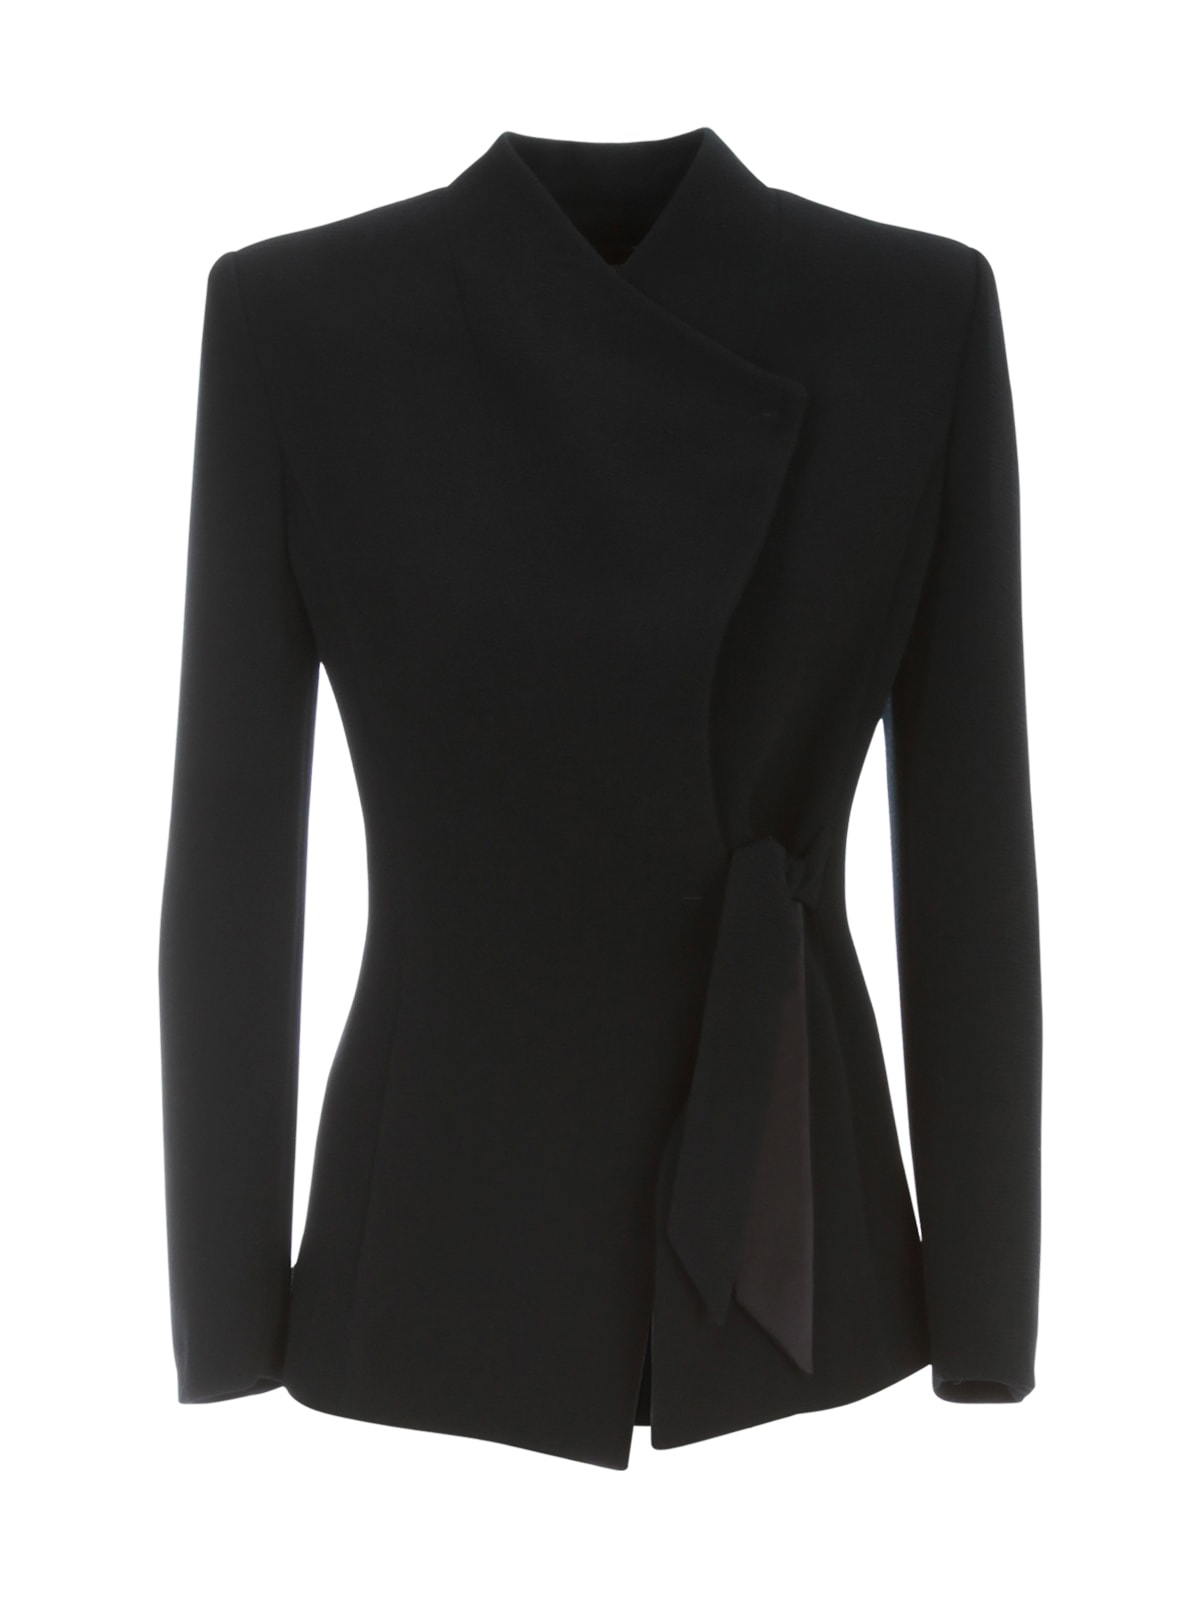 Emporio Armani Jacket Side Latch W/knot from Emporio ArmaniComposition: 96% Polyester, 4% Elastane